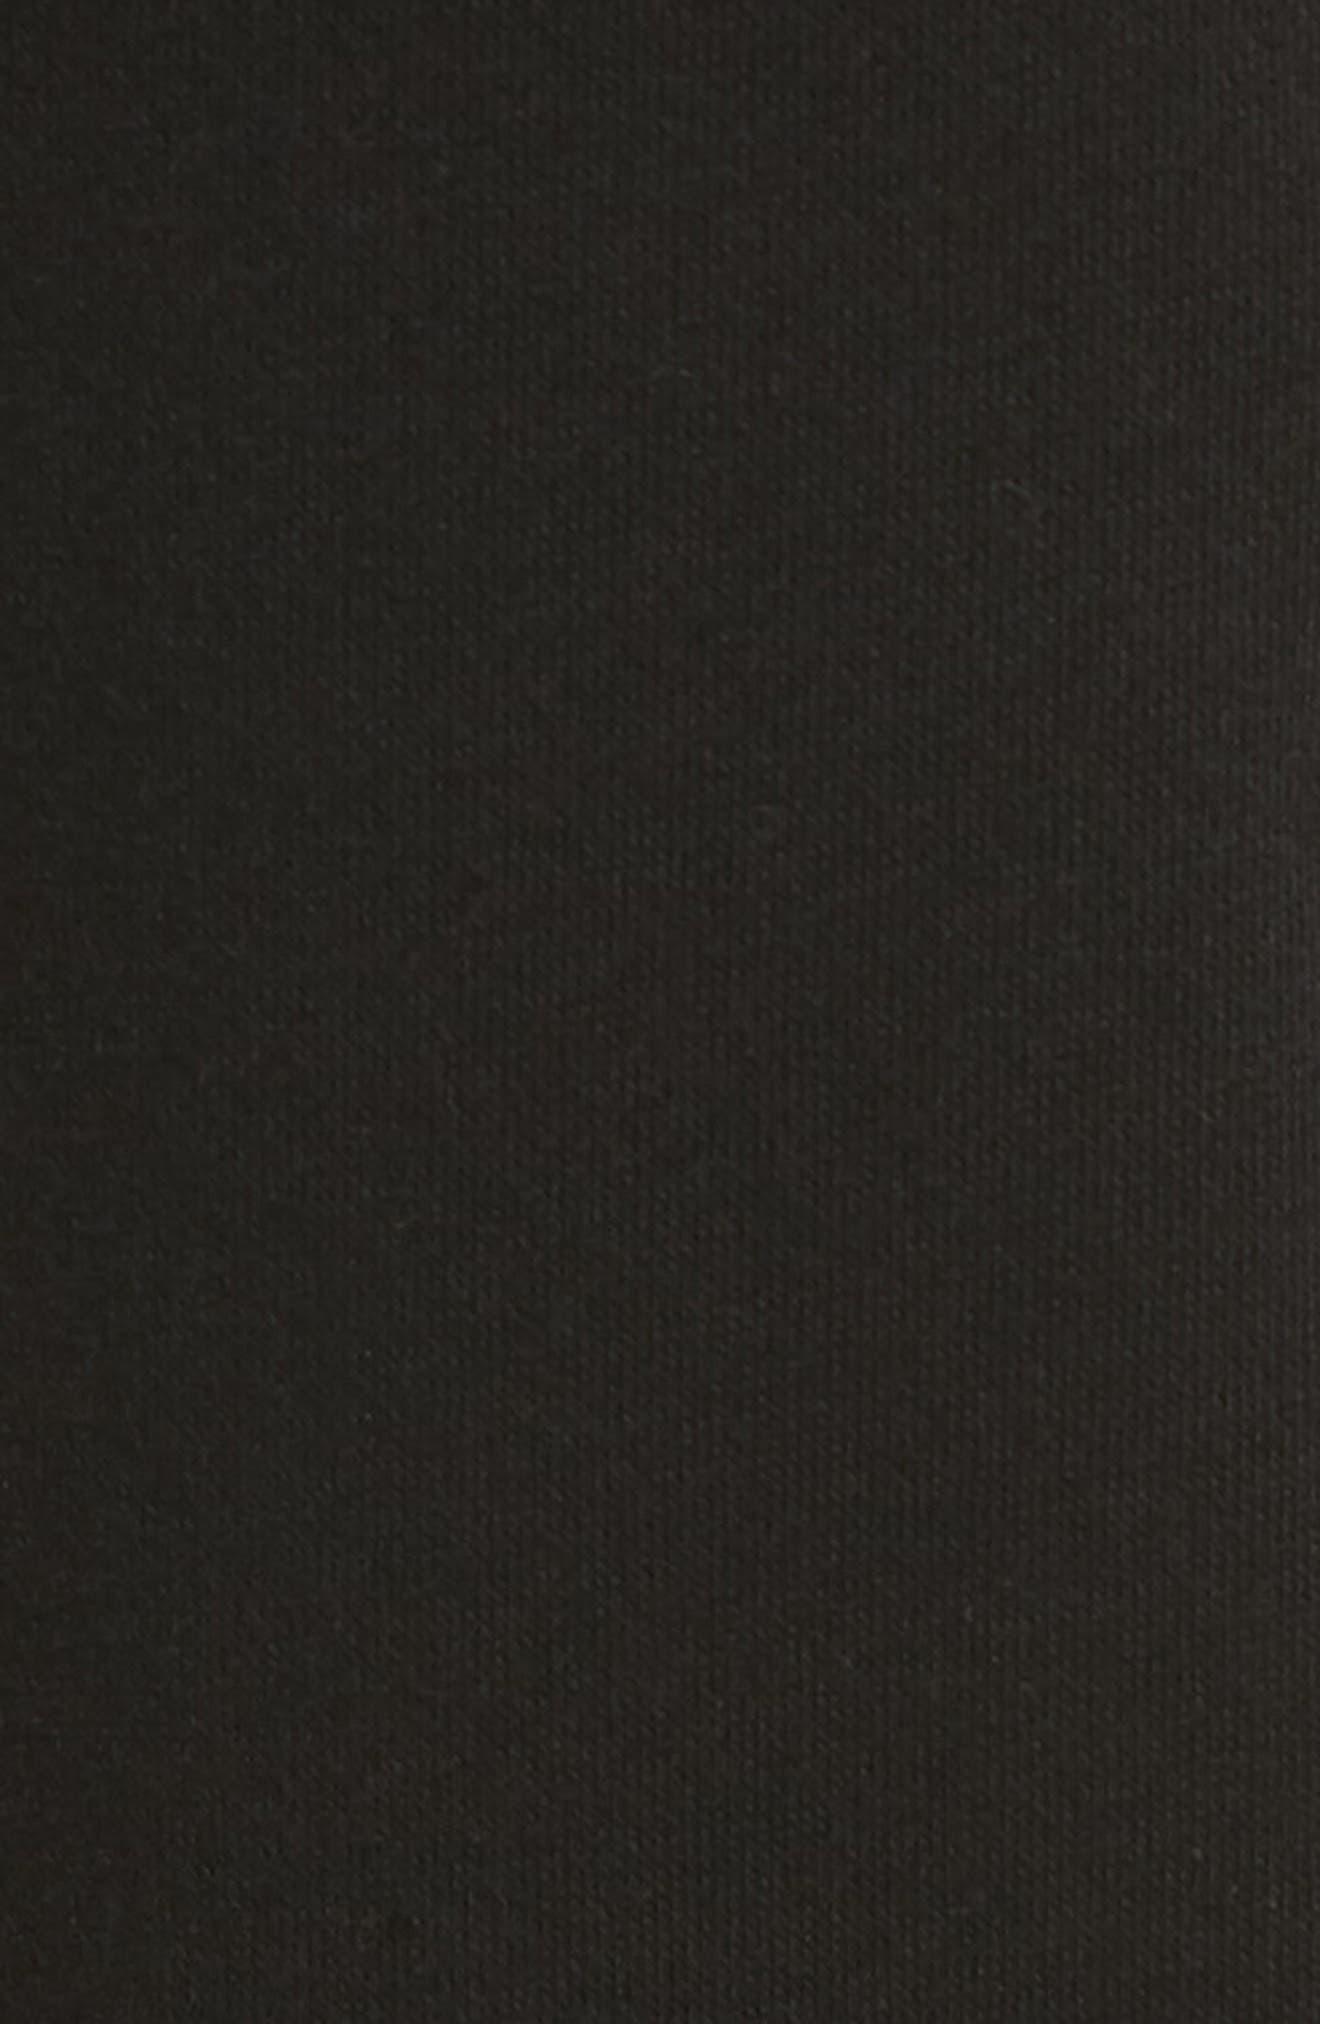 POLO RALPH LAUREN,                             Brushed Jersey Cotton Blend Jogger Pants,                             Alternate thumbnail 5, color,                             POLO BLACK